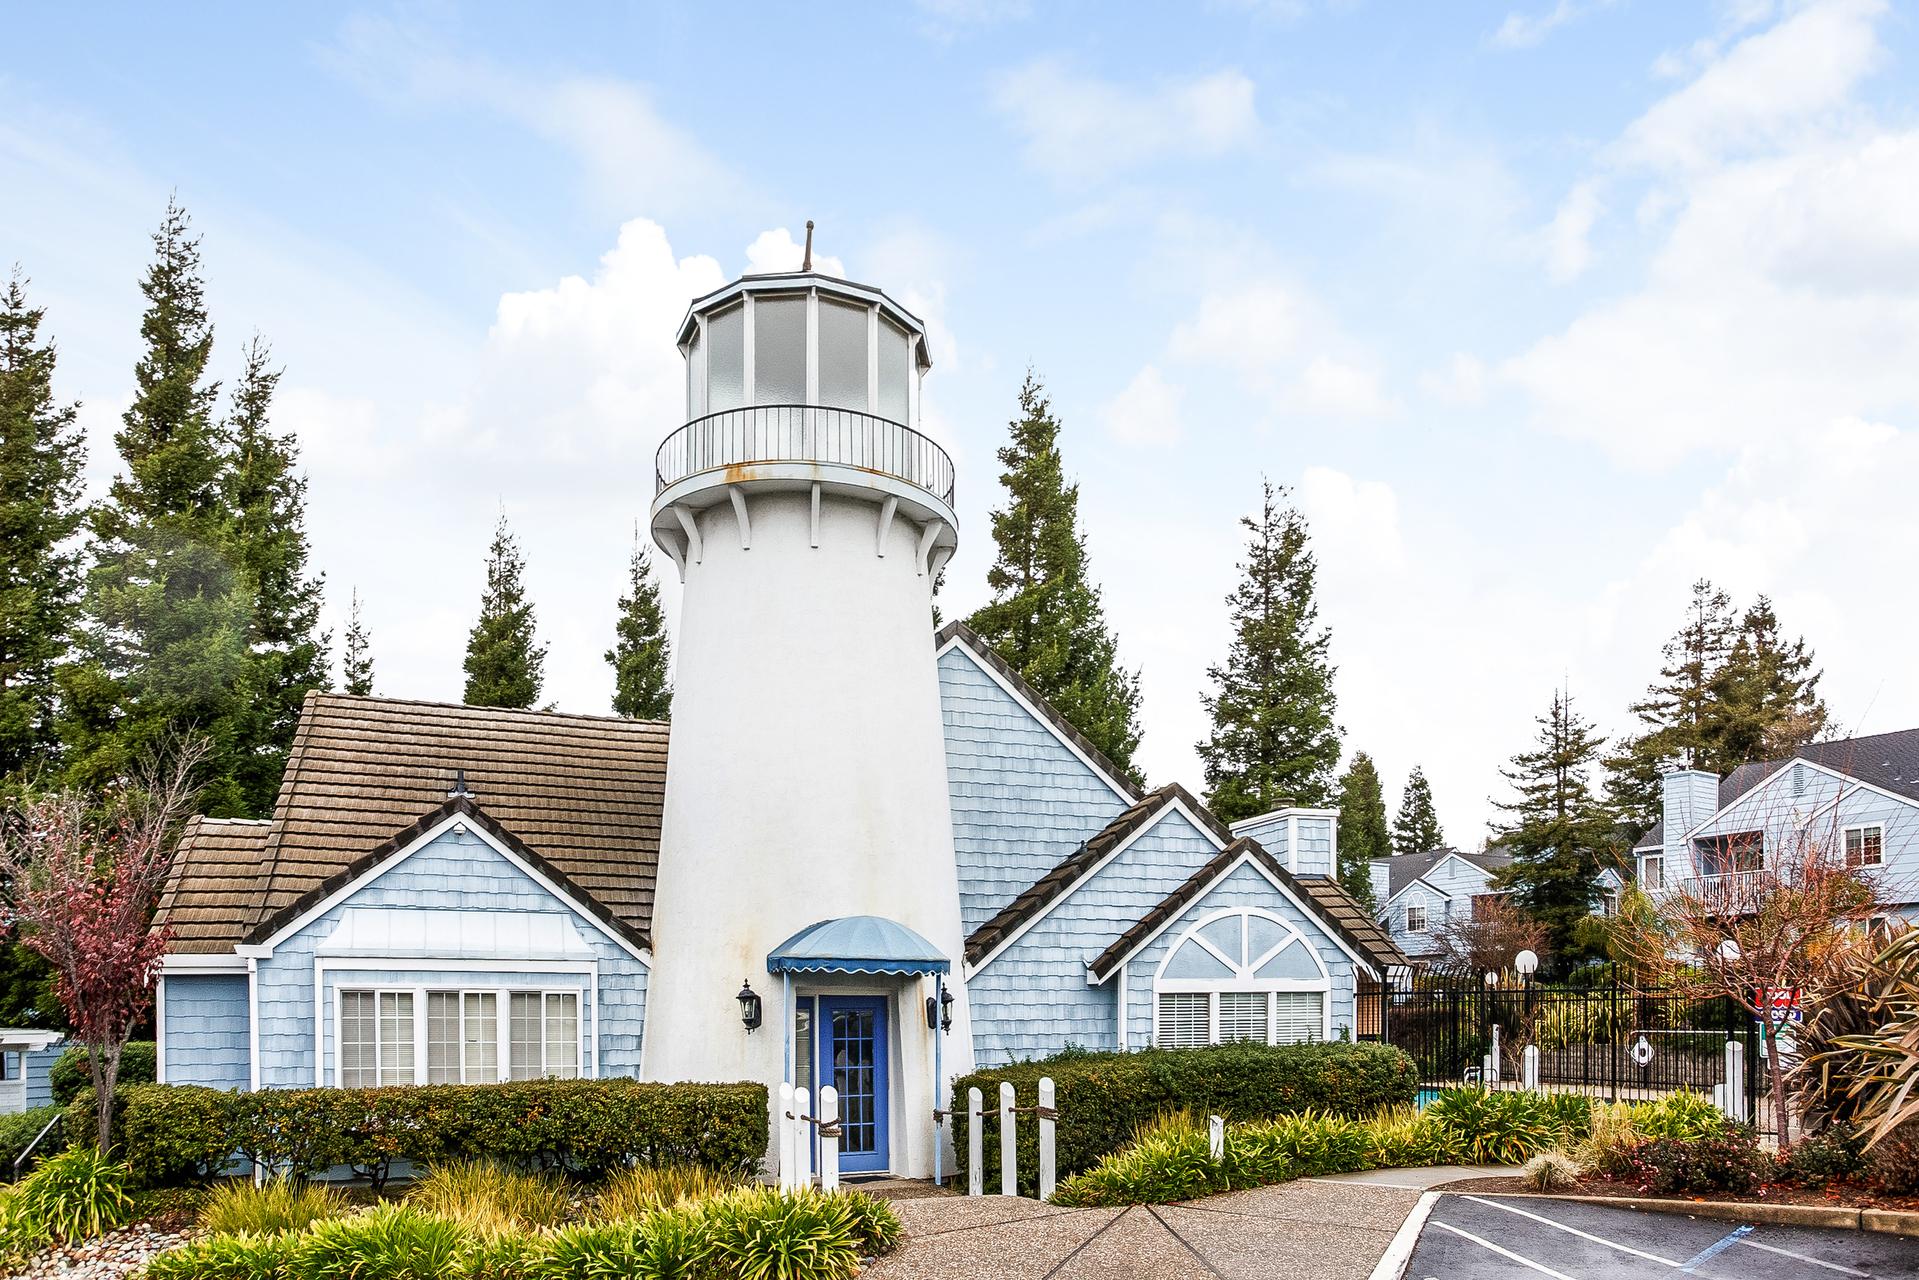 313 Lighthouse Dr, Vallejo,CA